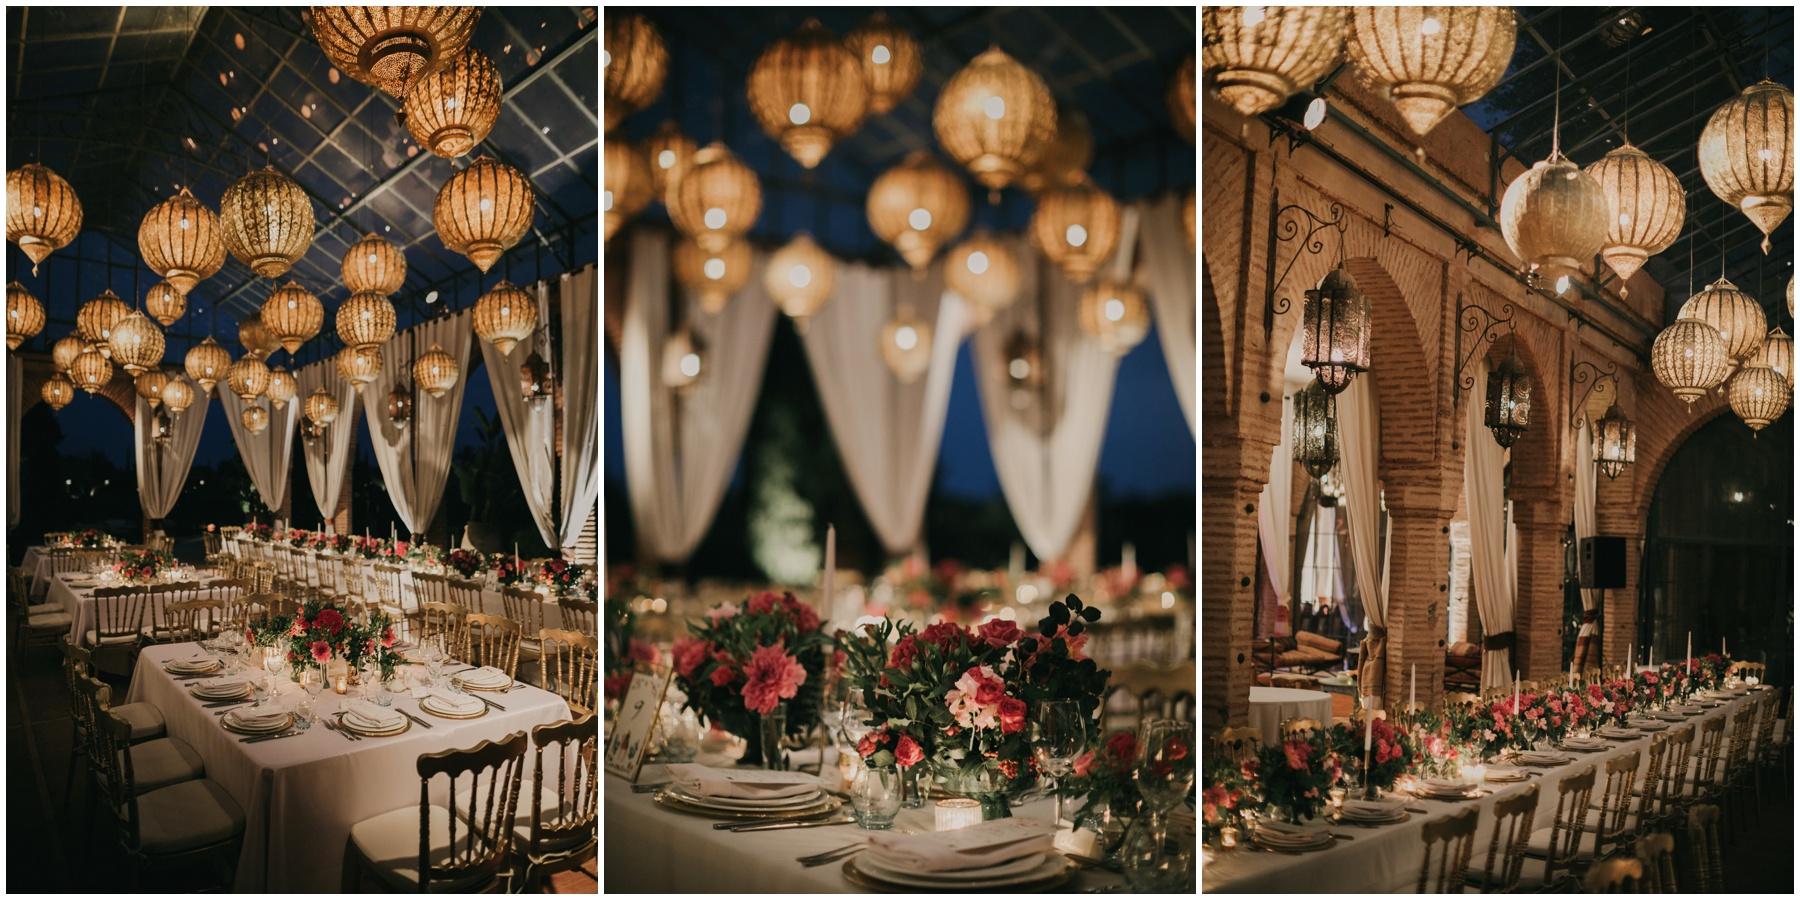 Marrakech Wedding Beldi Coutry Club 067.JPG